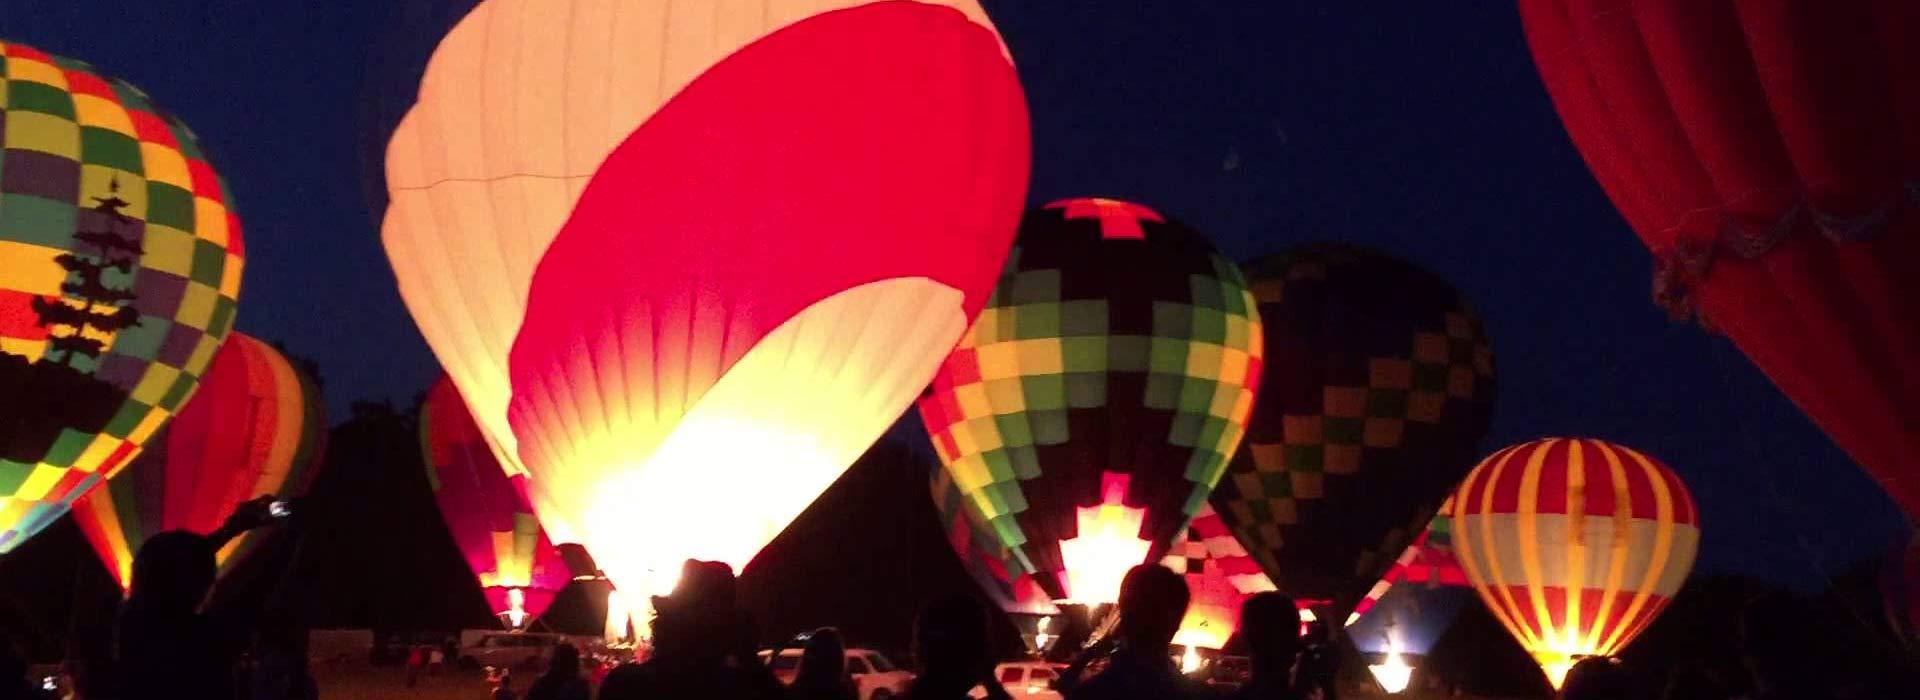 baloon-fest